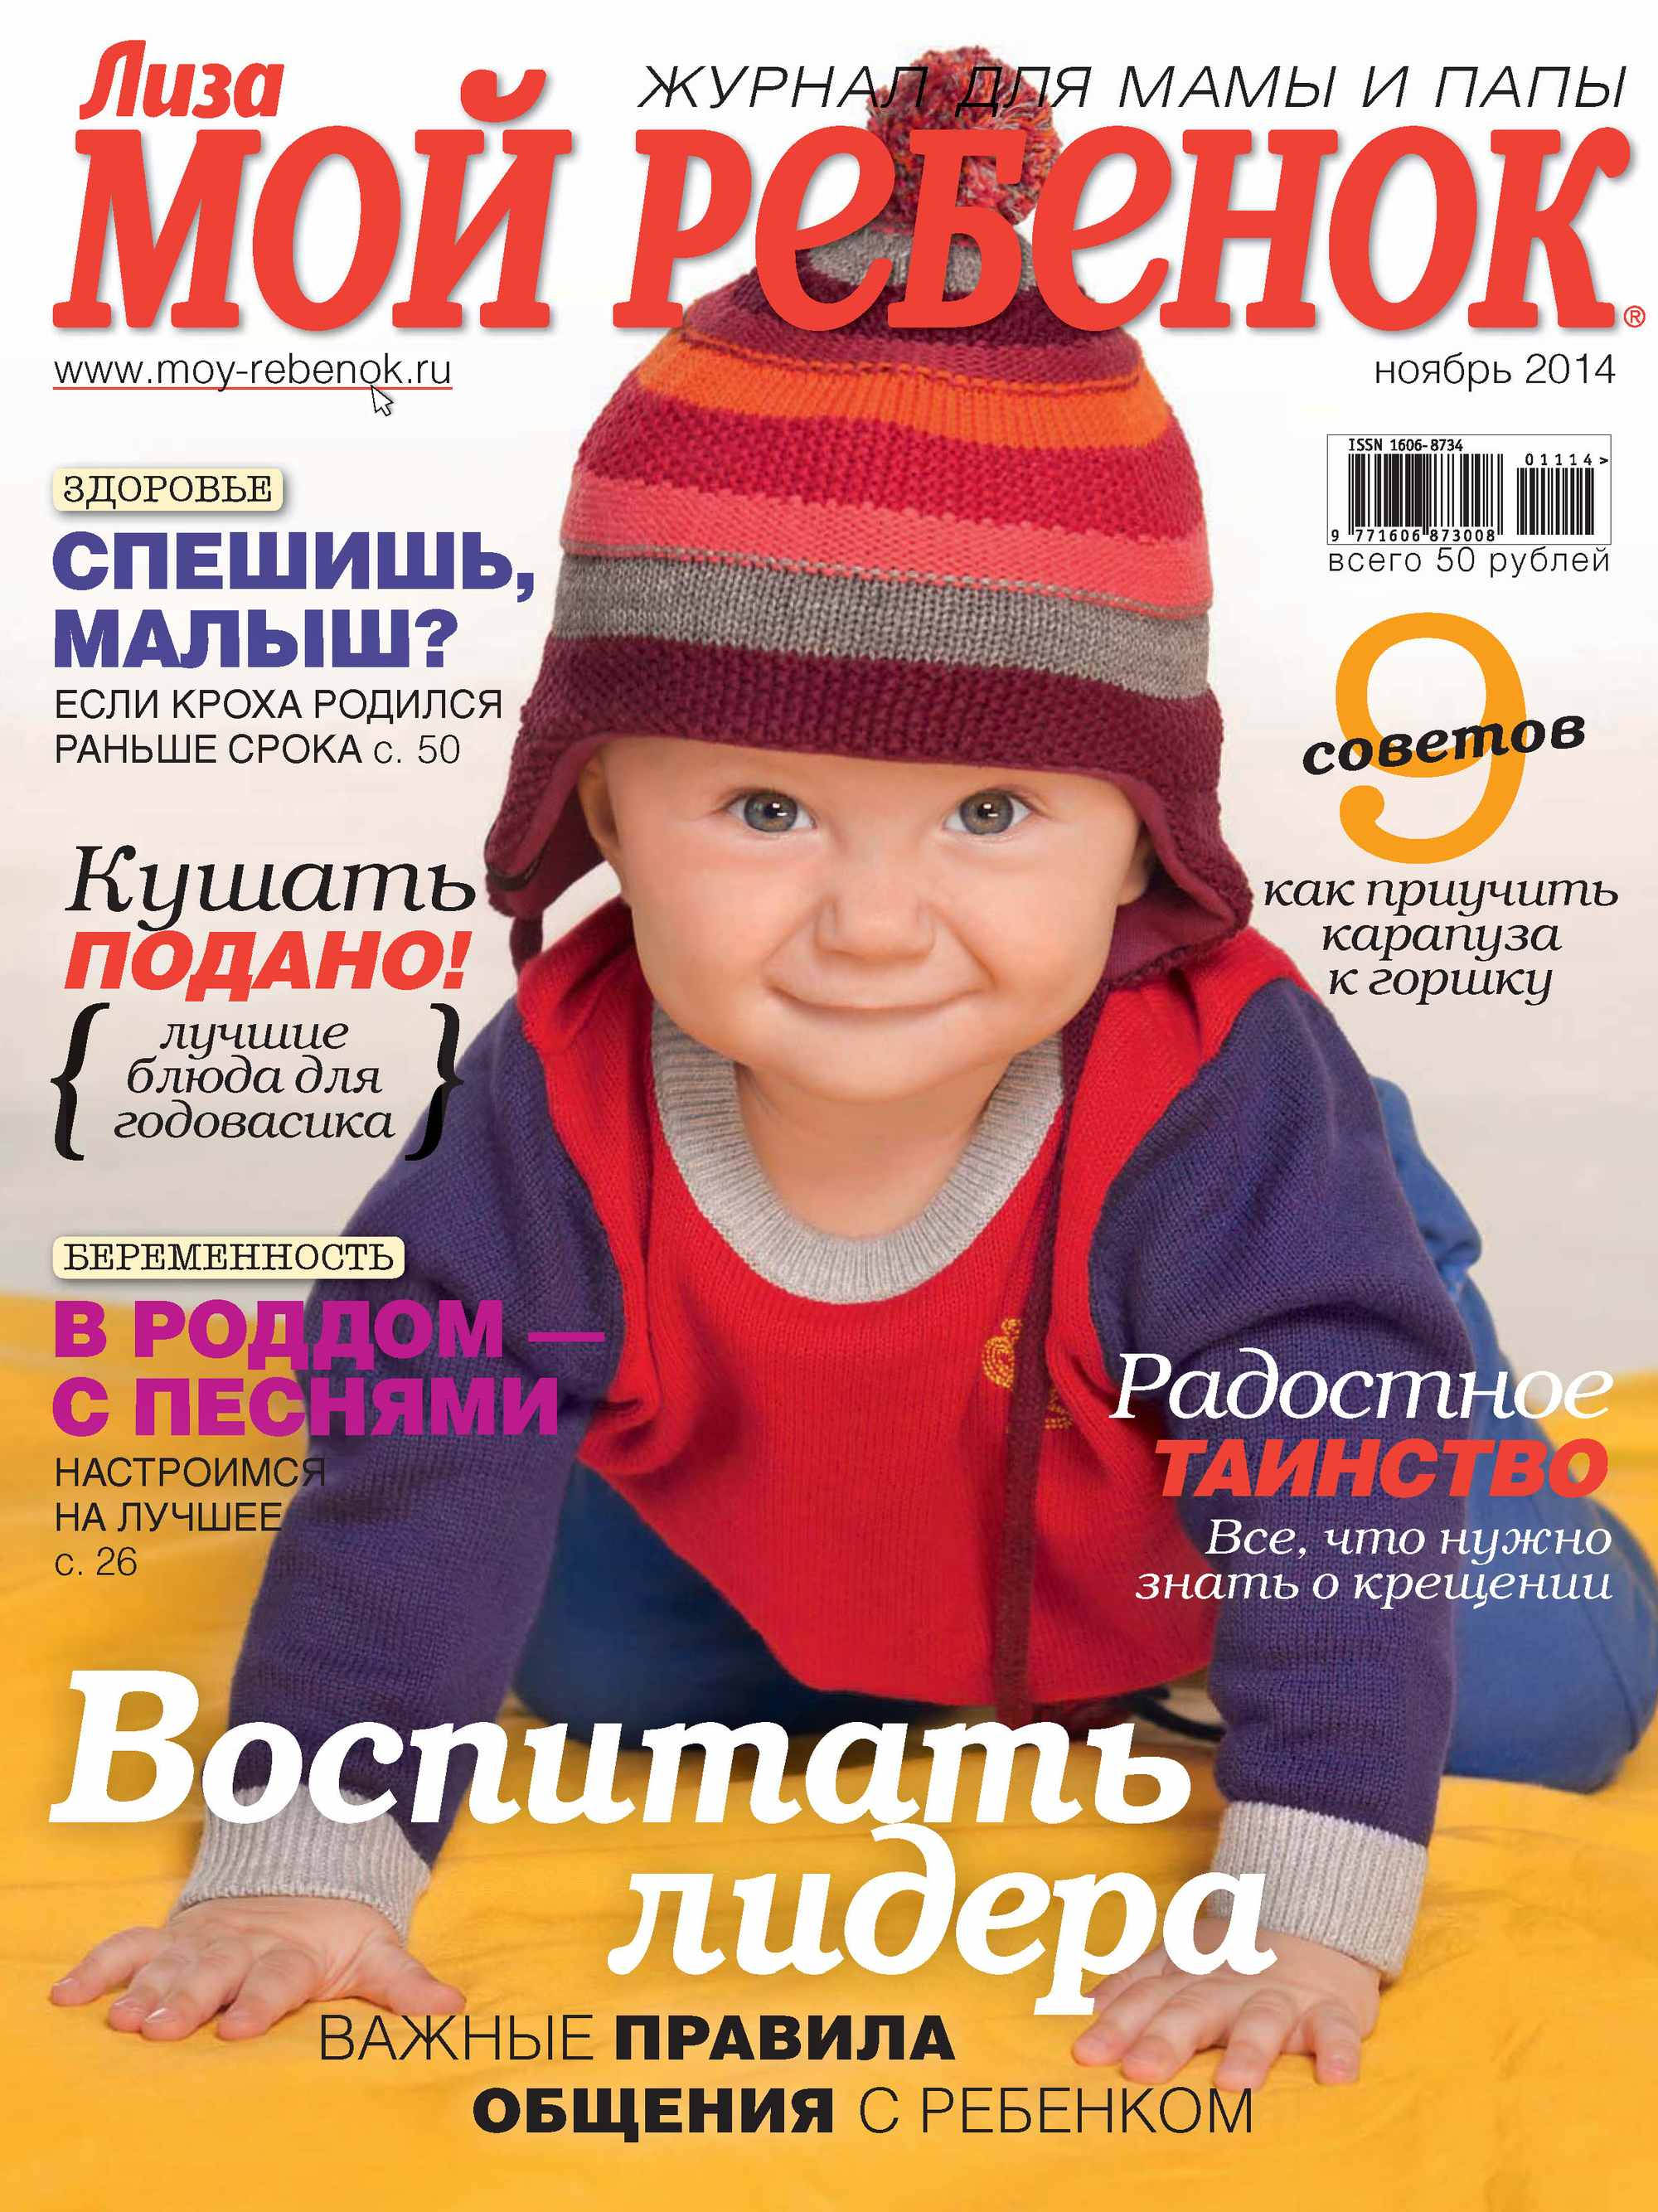 ИД «Бурда» Журнал «Лиза. Мой ребенок» №11/2014 ид бурда журнал лиза мой ребенок 03 2014